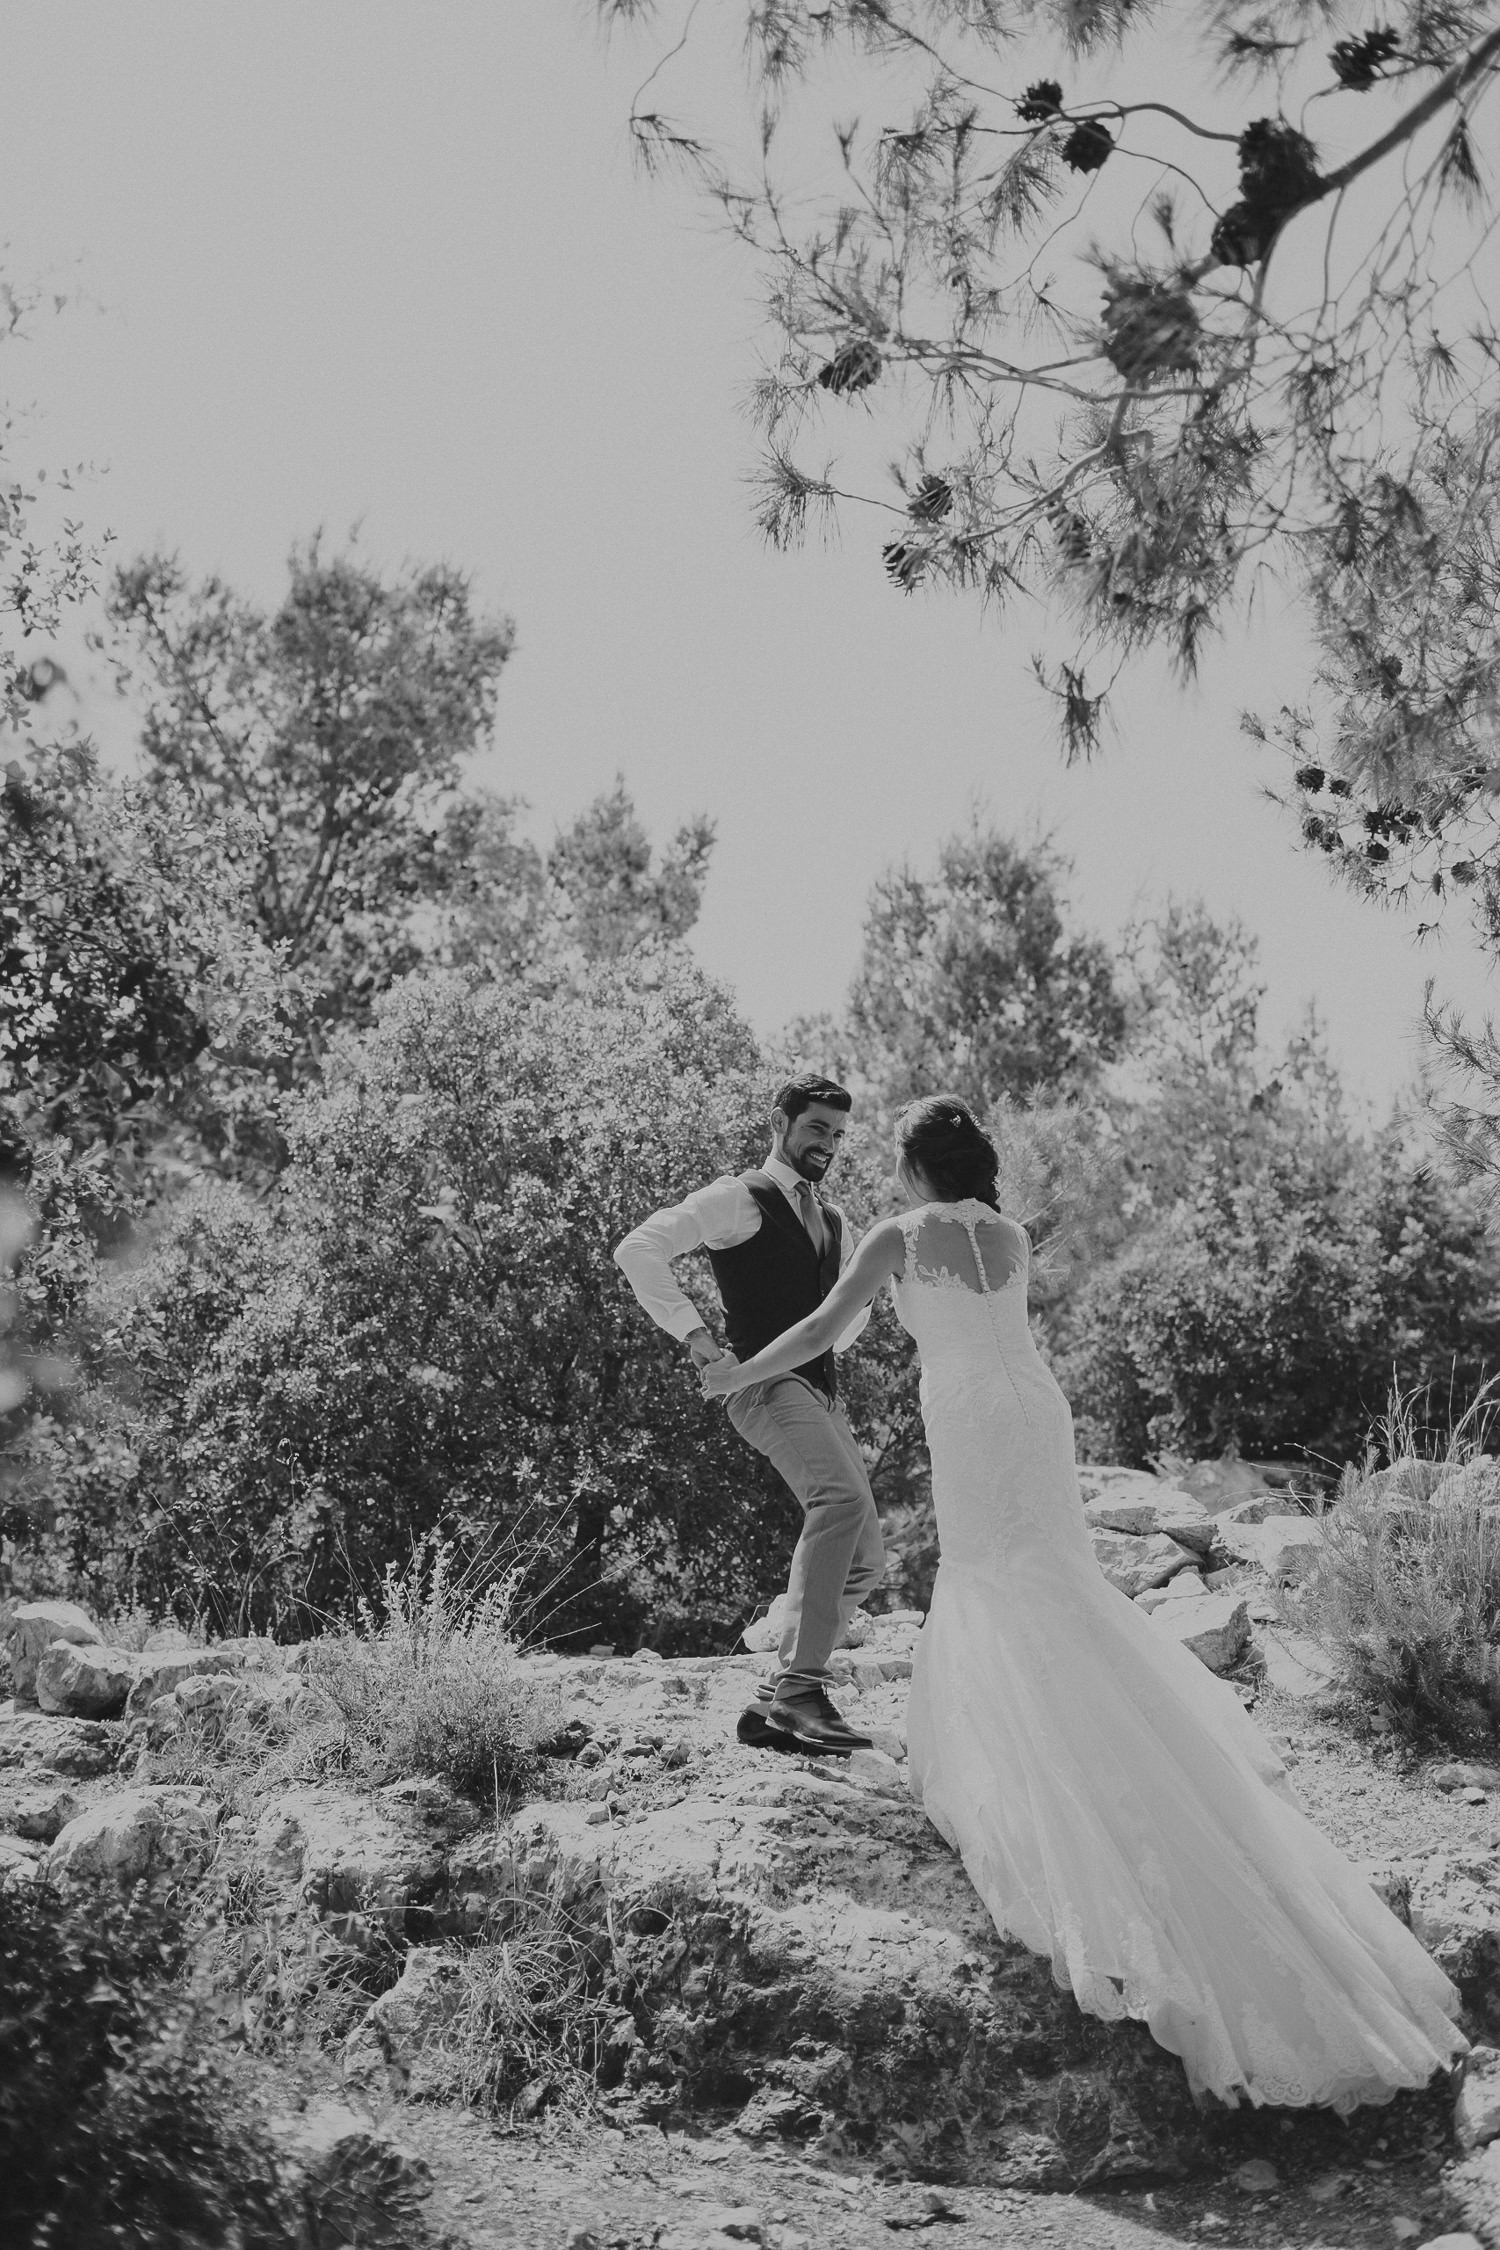 Countryside Wedding - Liron Erel - Echoes & Wildhearts 0027.jpg